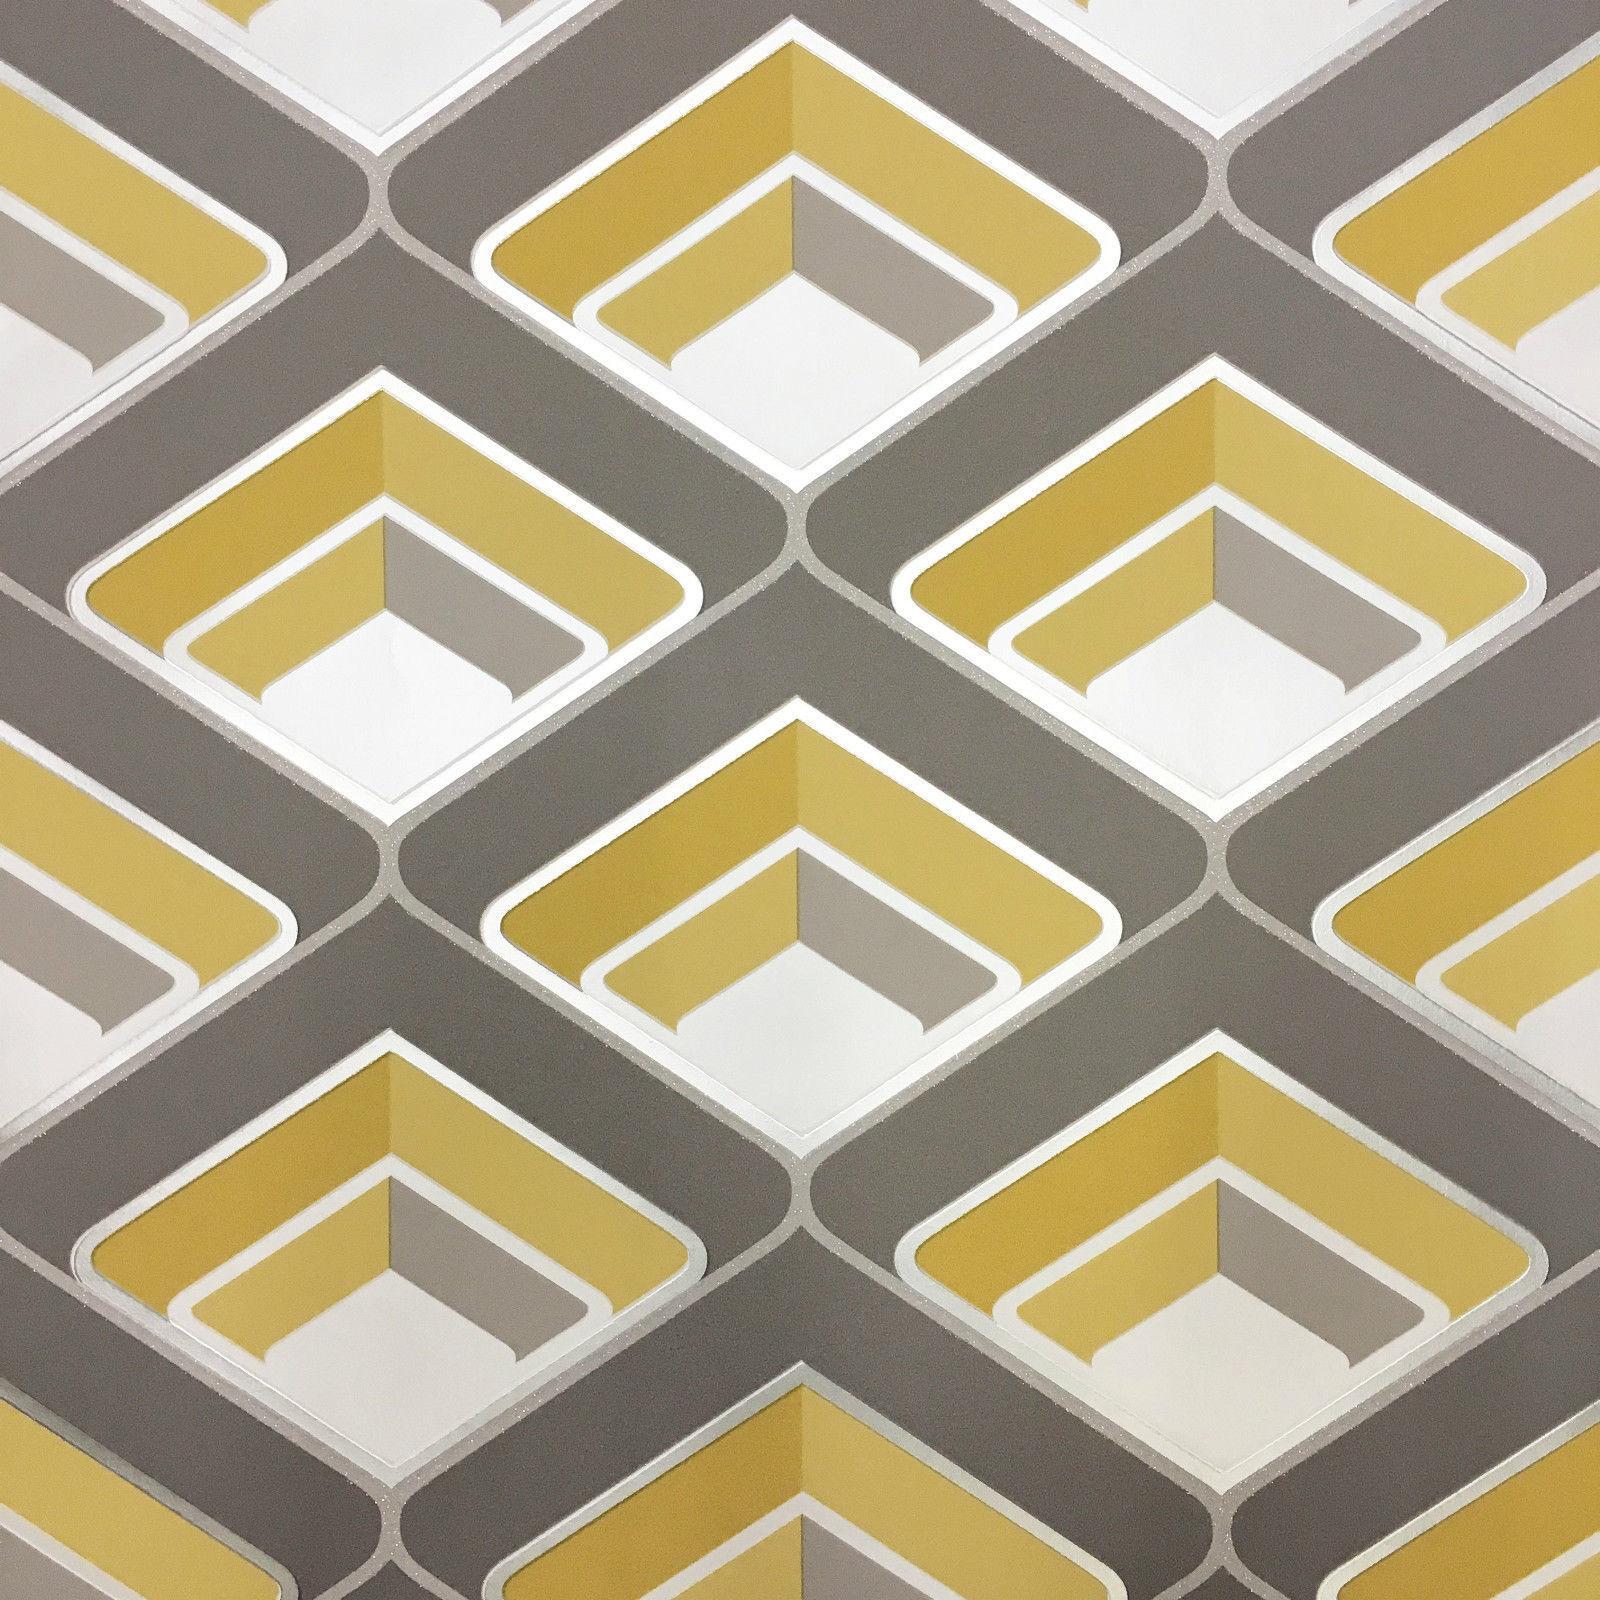 grandeco geo in yellow geometric 3d effect retro. Black Bedroom Furniture Sets. Home Design Ideas